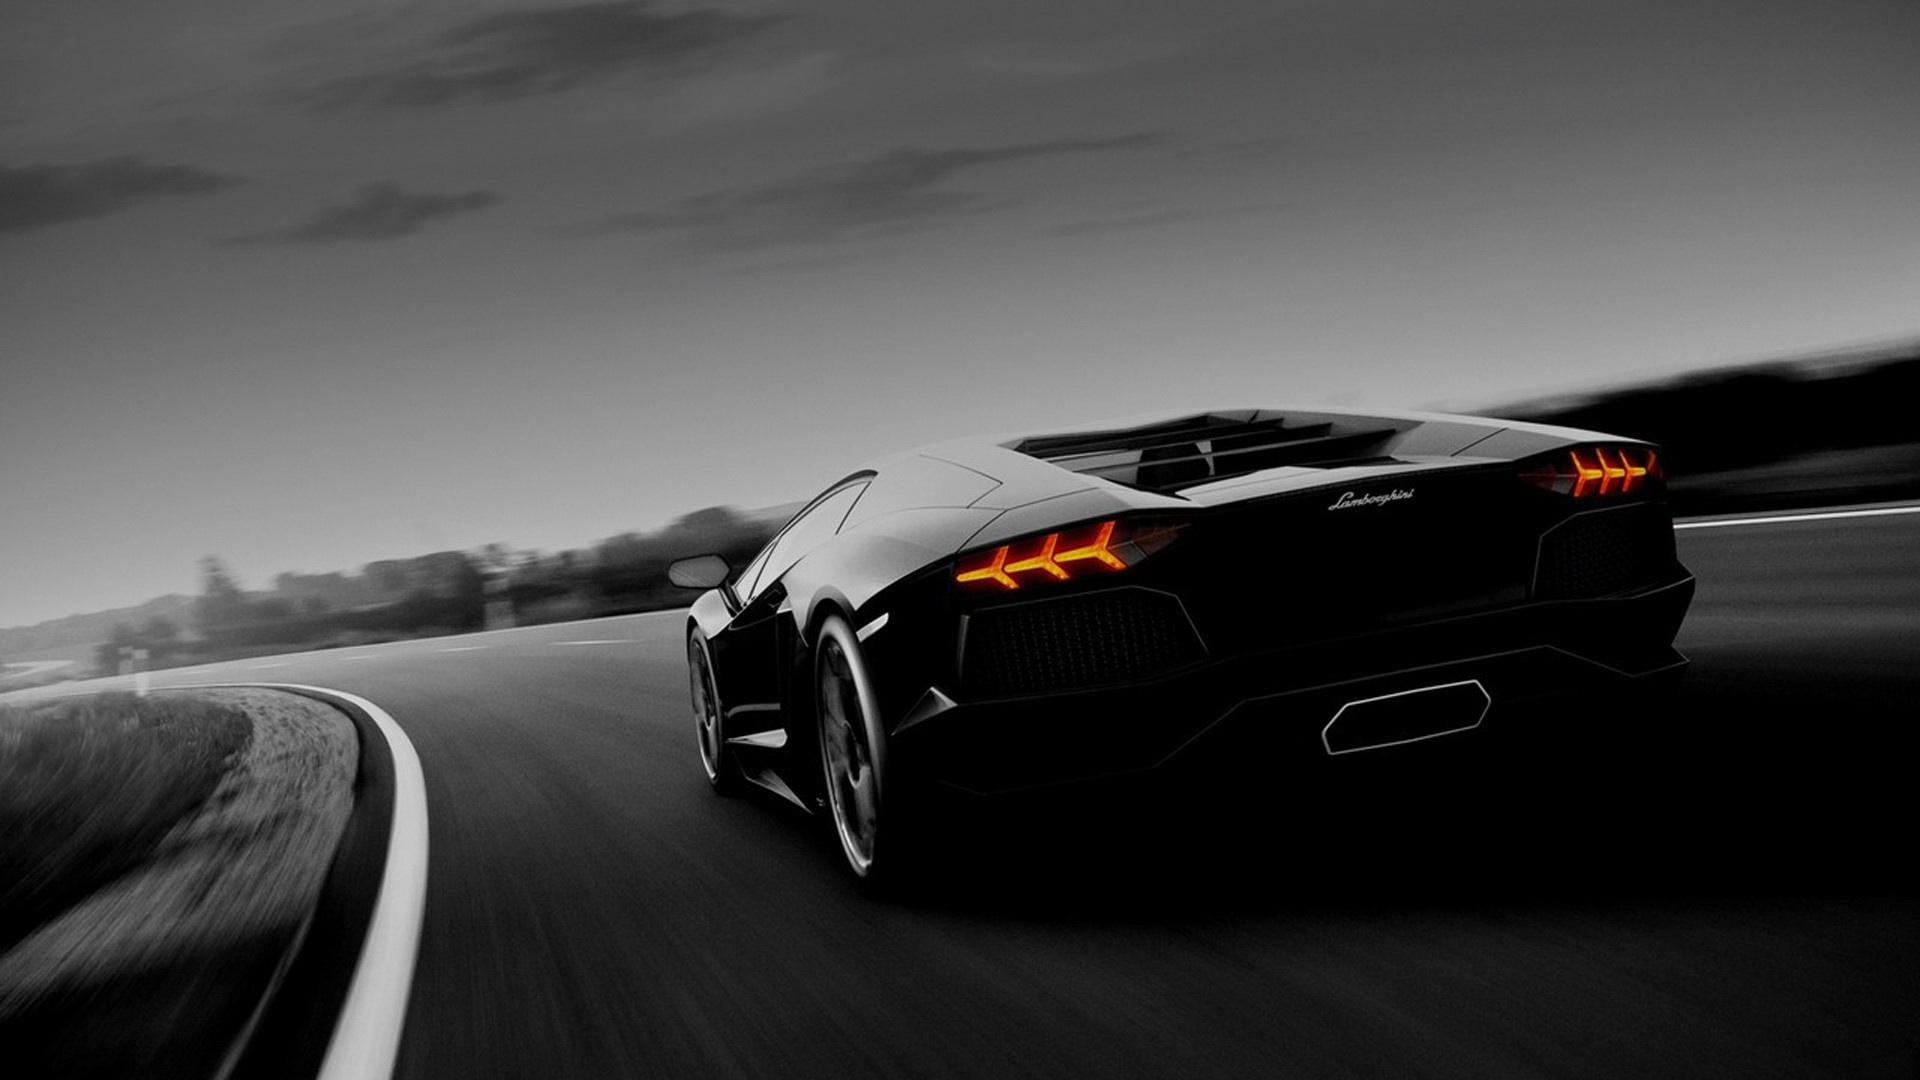 Black Lamborghini Murcielago Racing desktop PC and Mac wallpaper 1920x1080